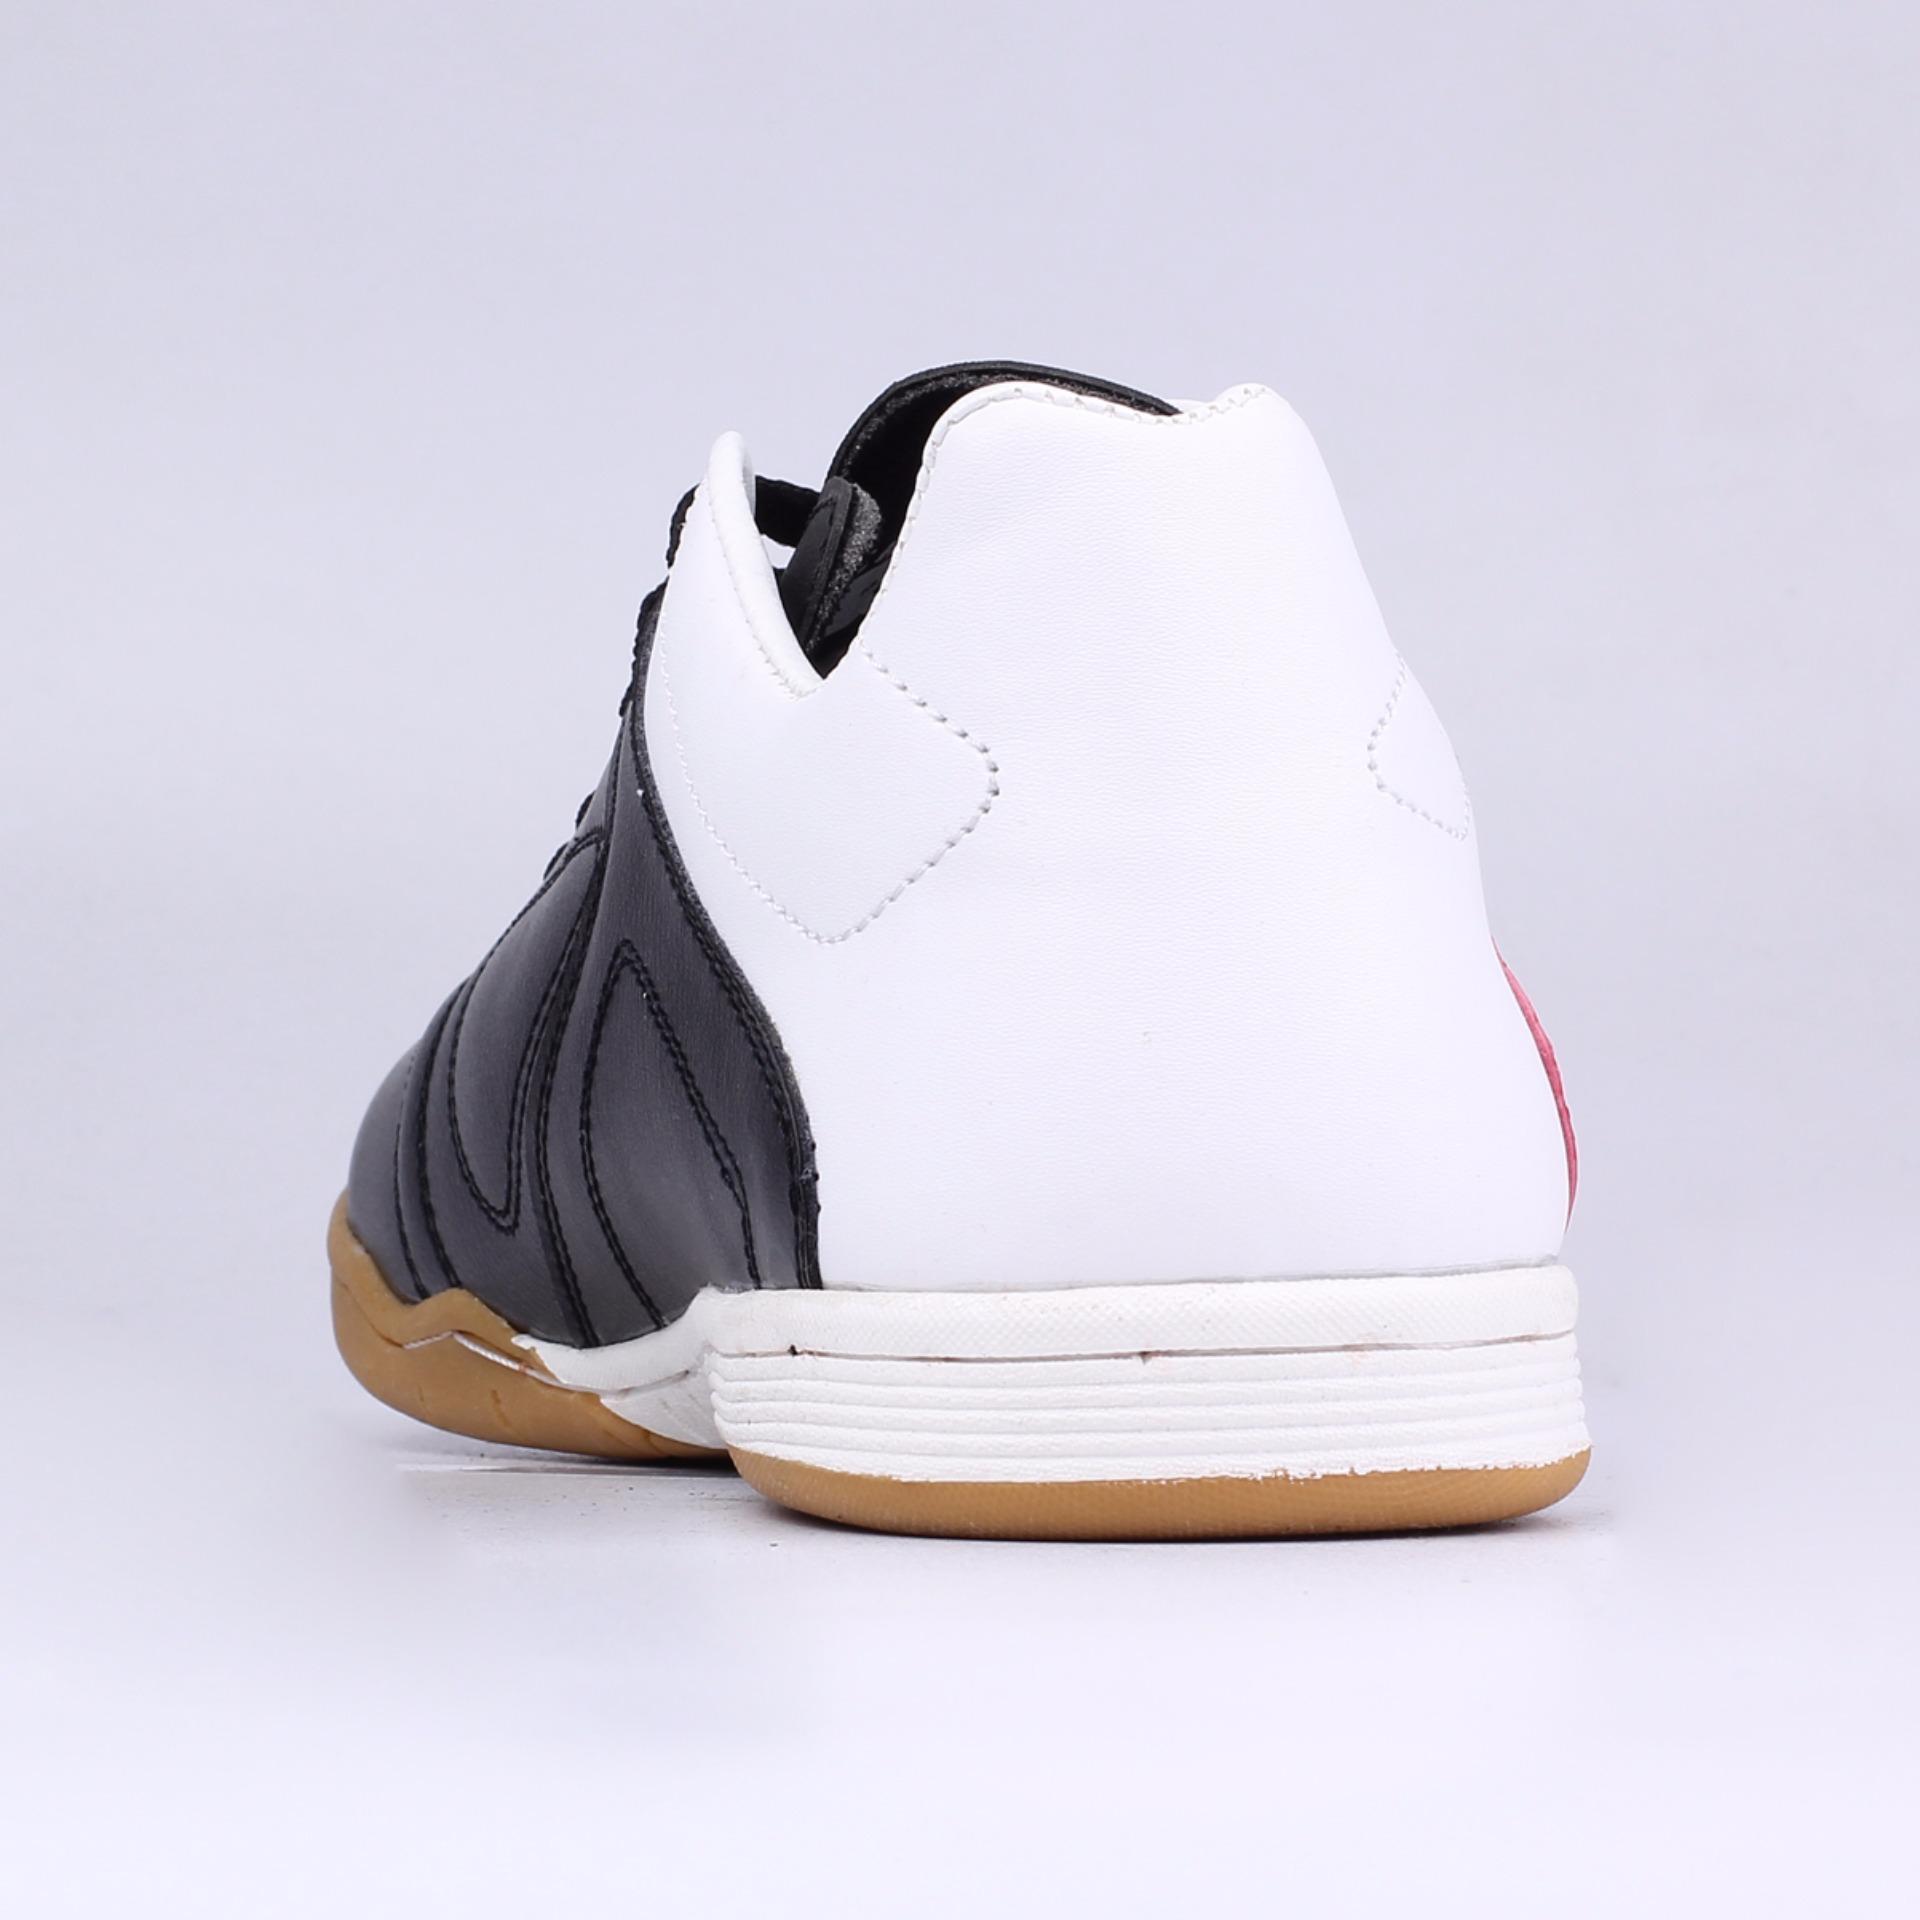 Terbaik Murah Catenzo Sport Shoes Sepatu Futsal Pria Ns 093 High Super Black White